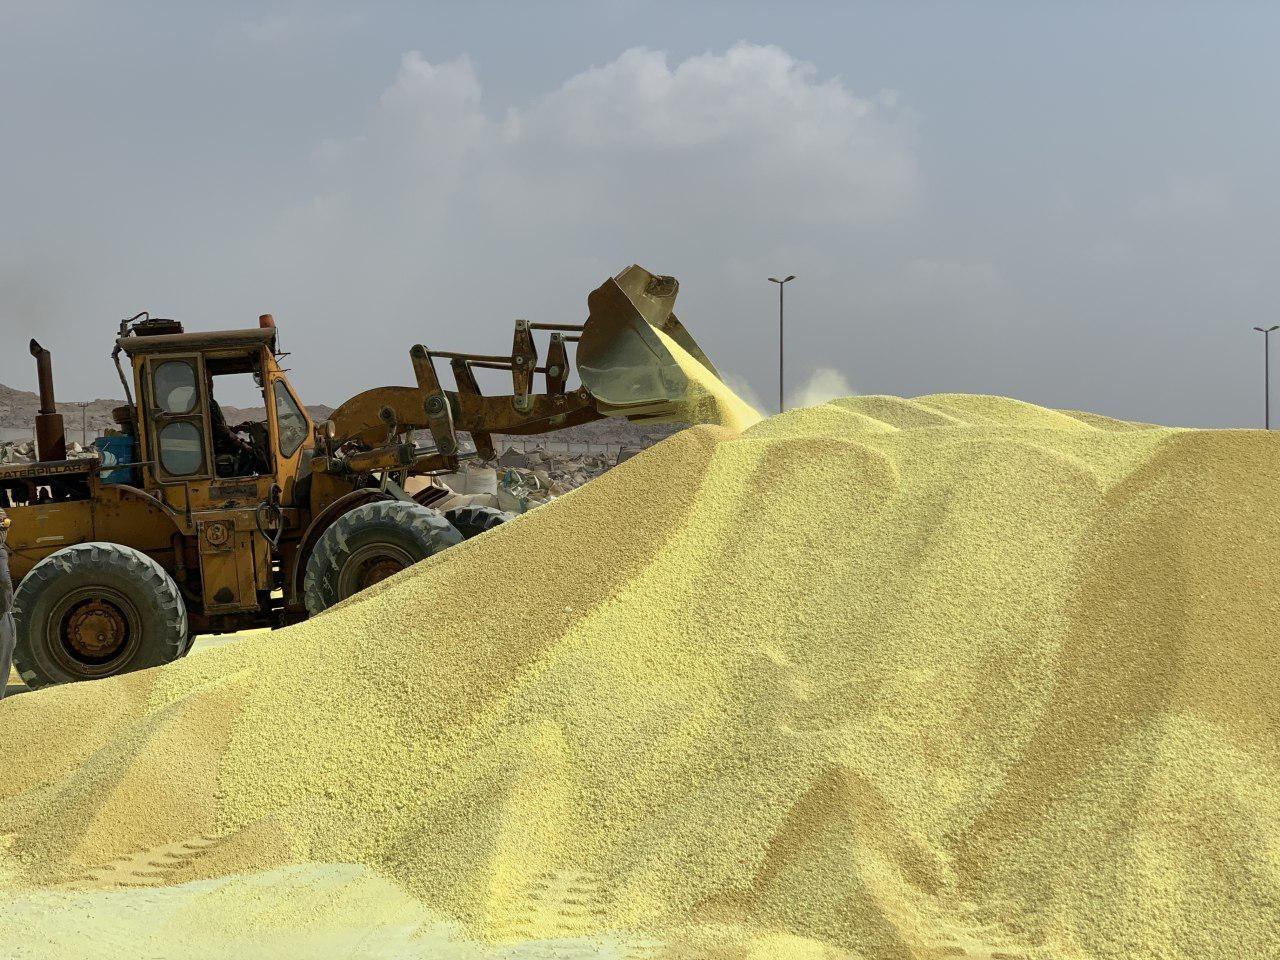 sulfur supplier, turkminestan sulfur, wholesale sulfur supplier, sulfur price, sulfur for sale, sulfur suppliers, sulphur suppliers